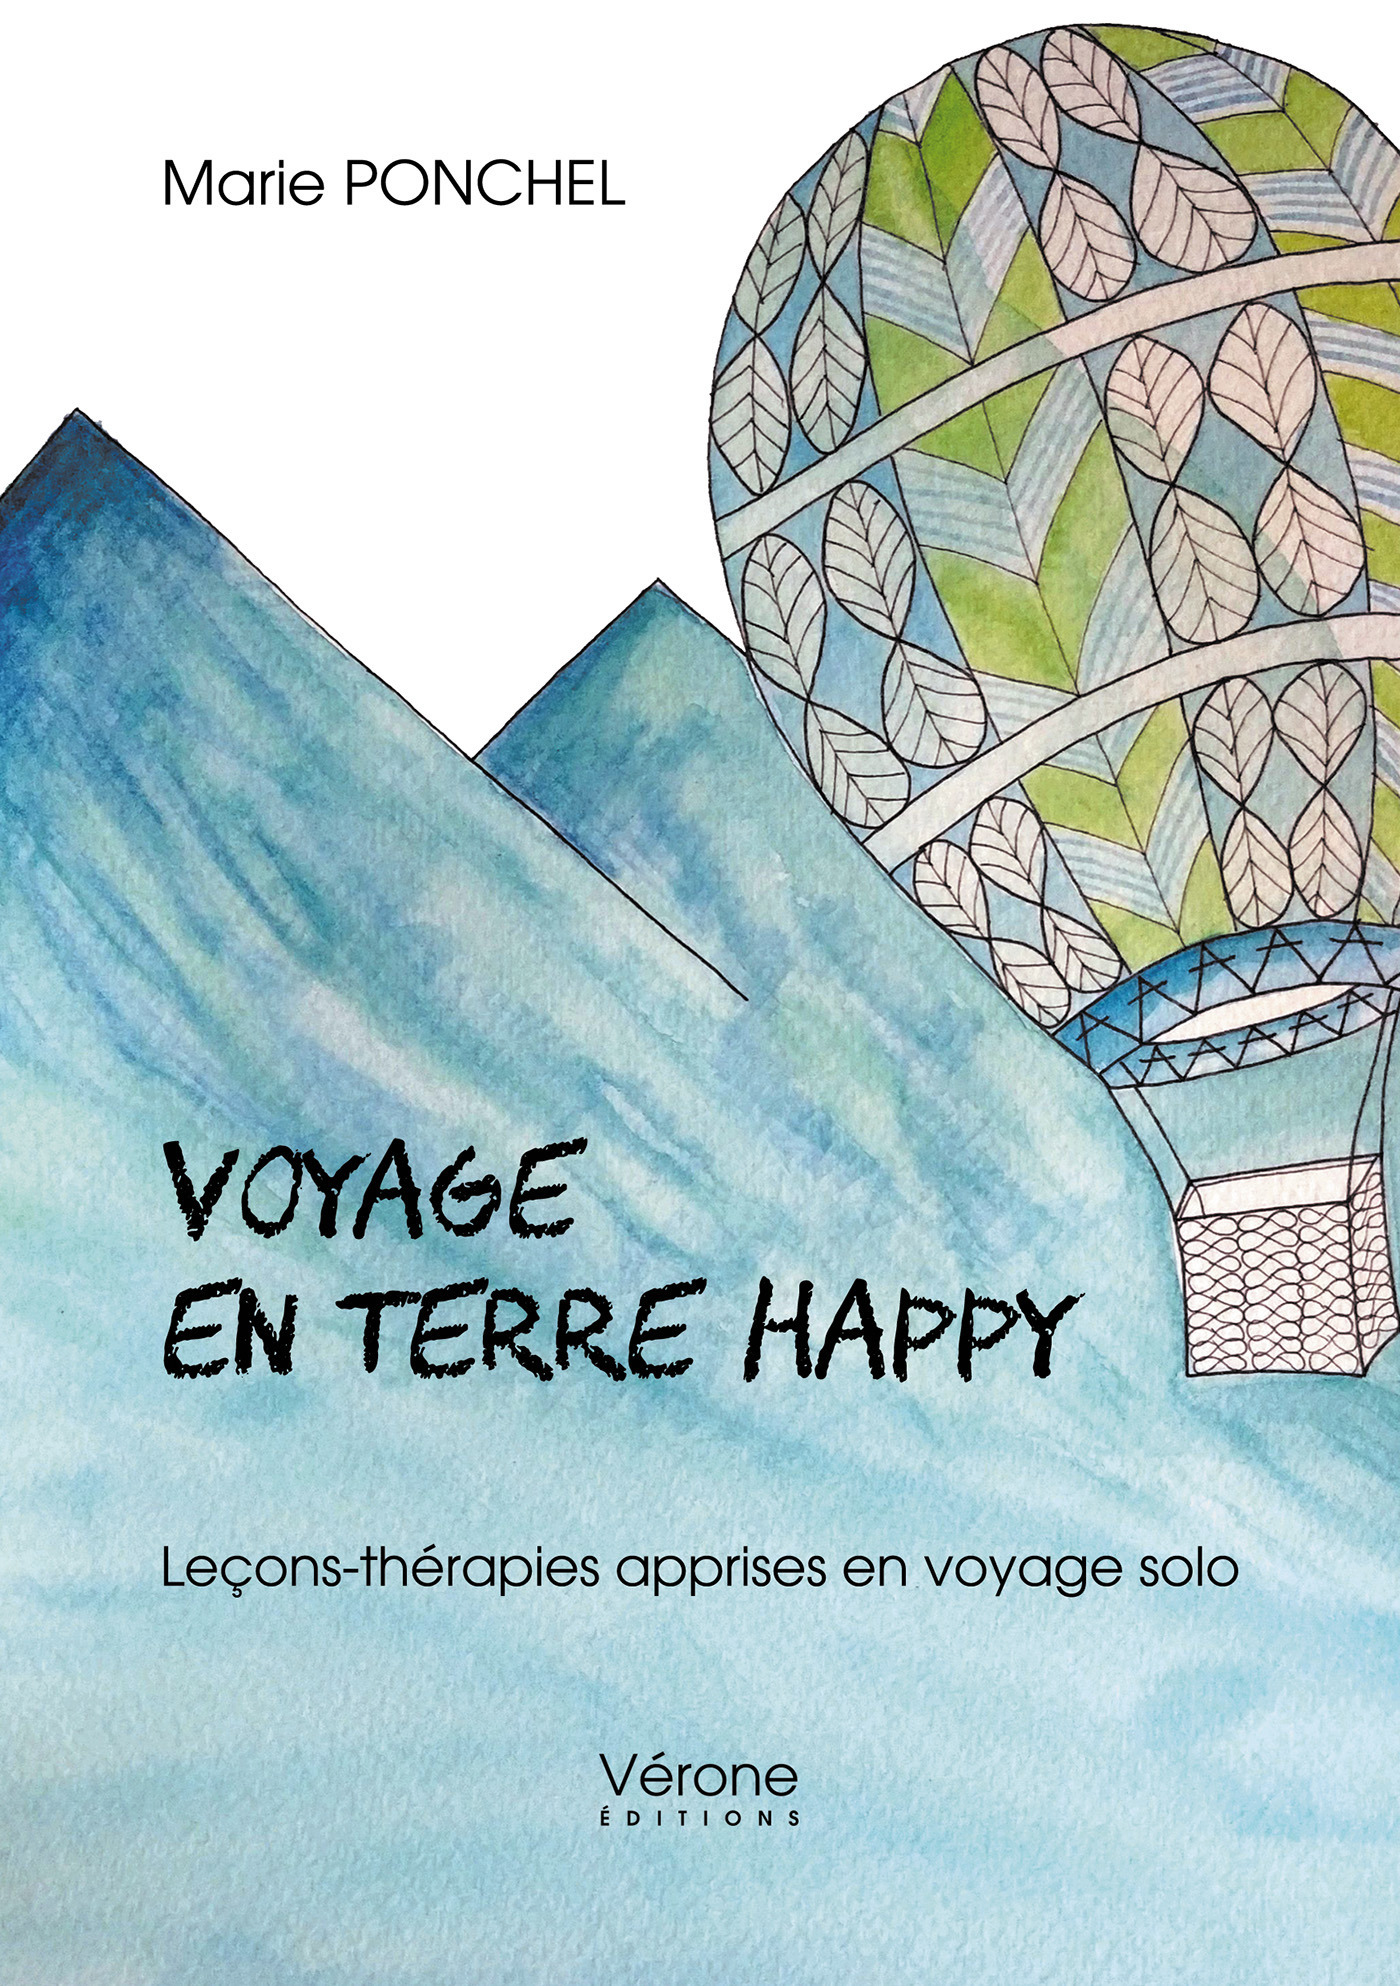 Voyage en terre happy ; leçons-thérapies apprises en voyage solo